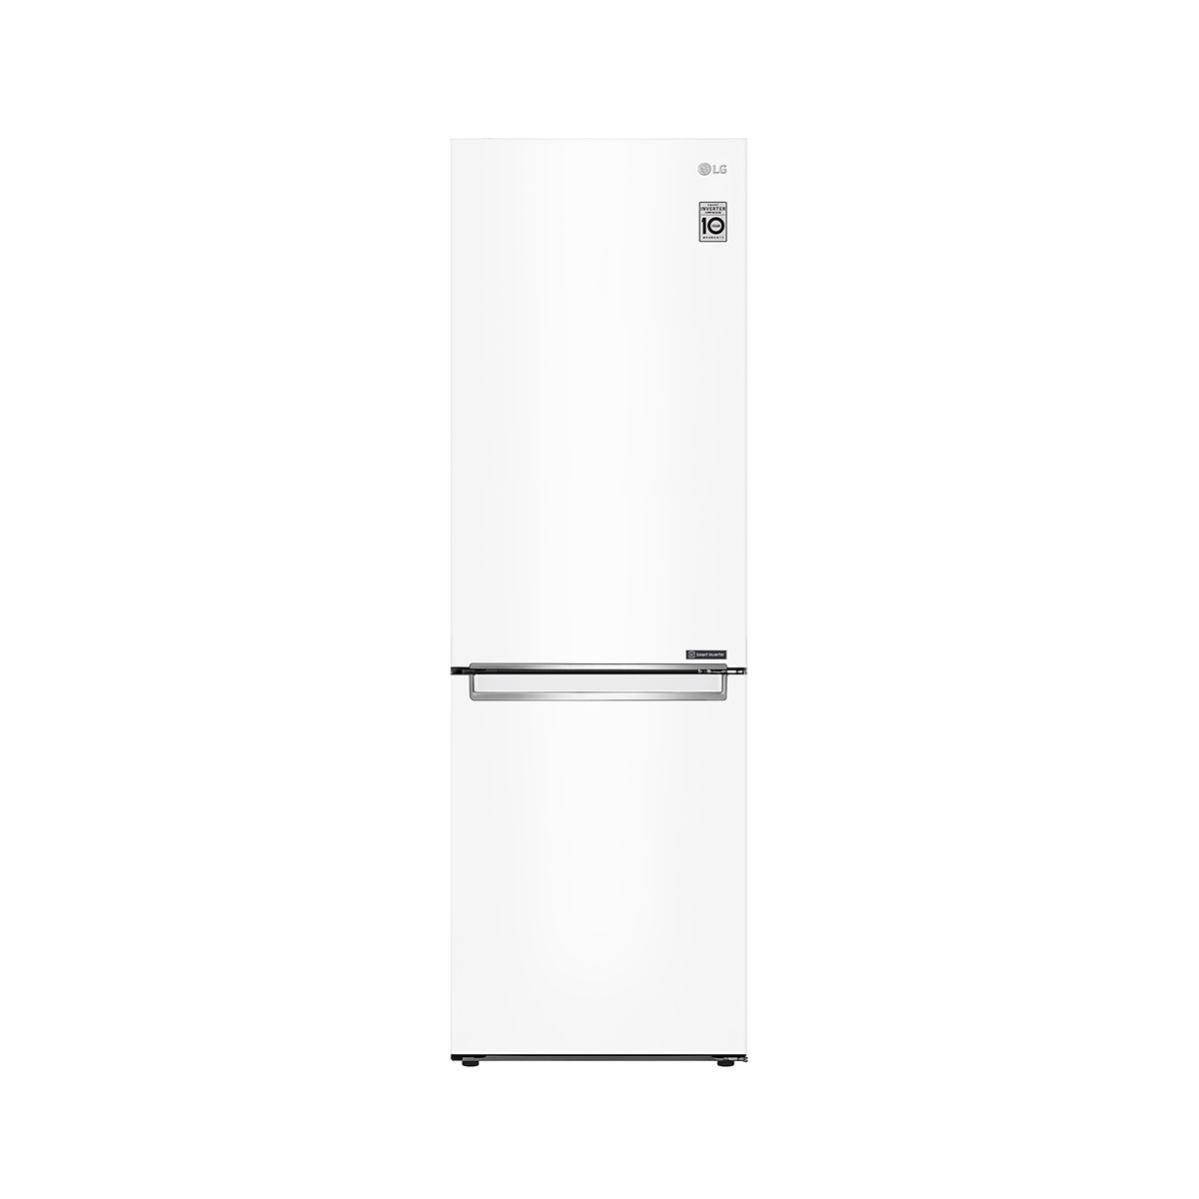 Photo Réfrigérateur Combiné LG GBP31SWLZN